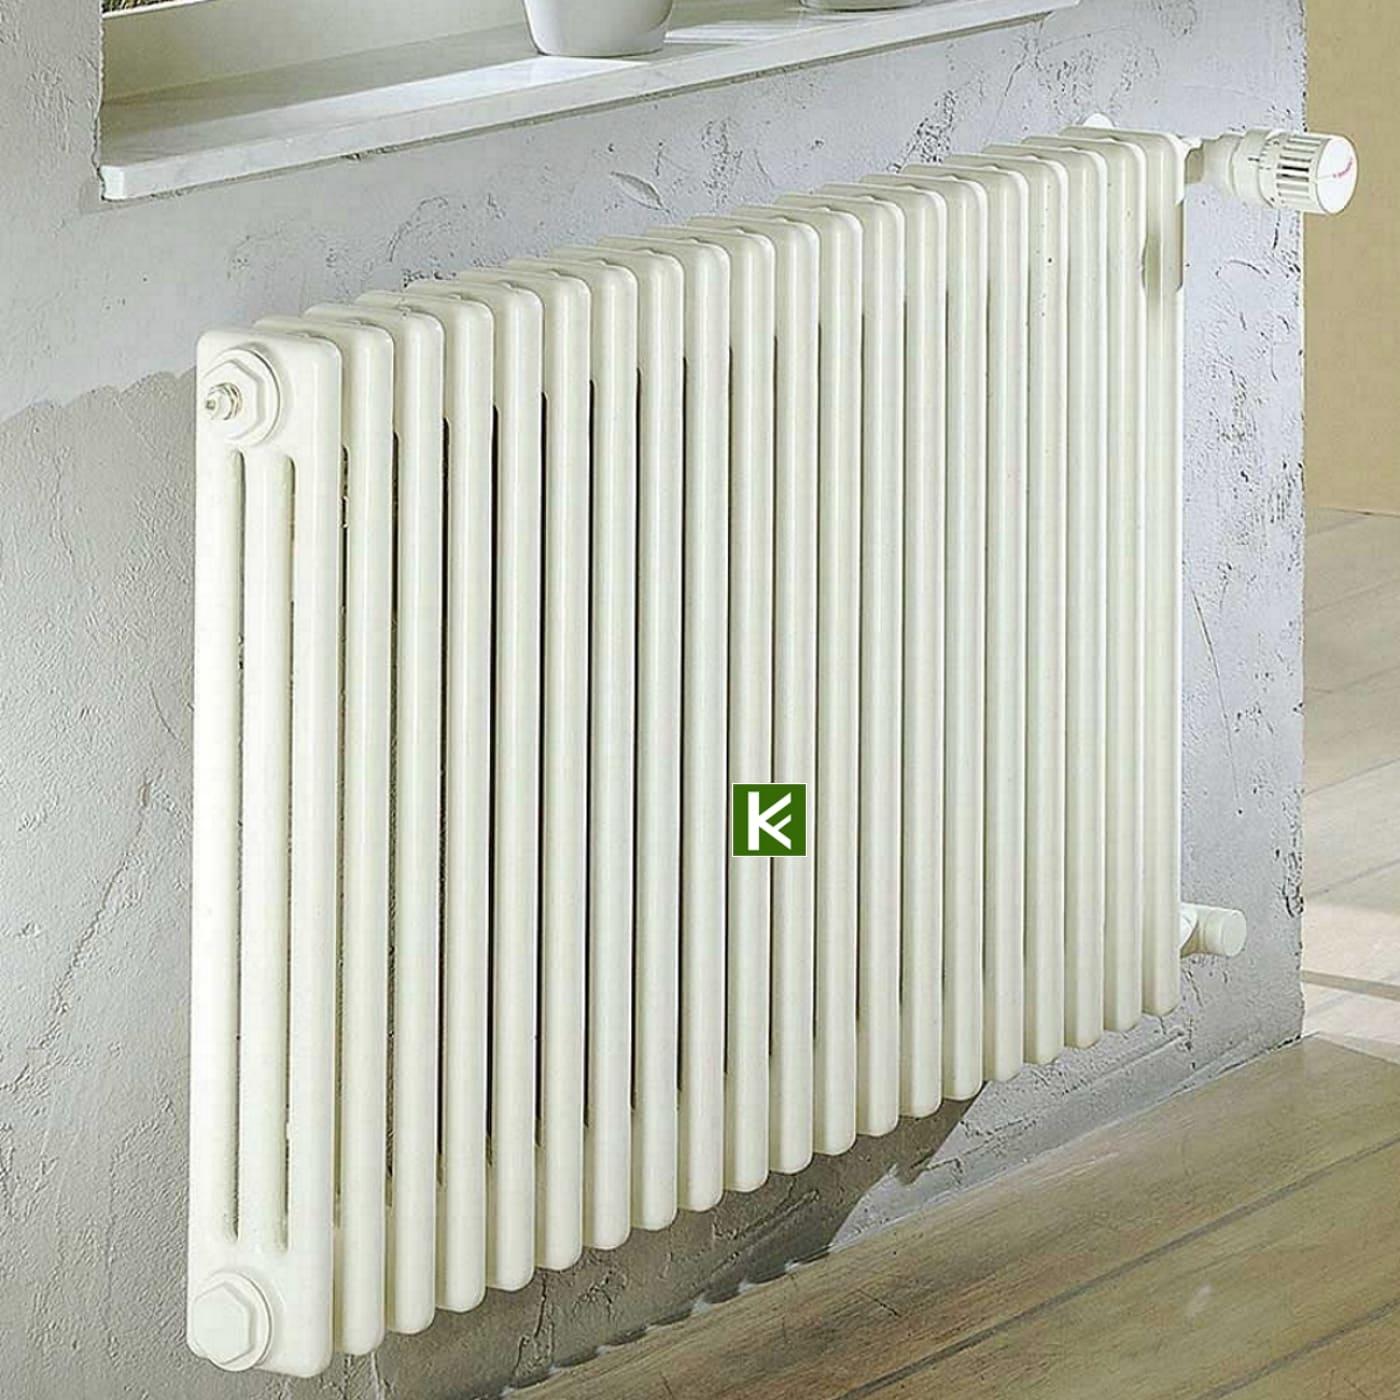 радиаторы отопления Zehnder Charleston 3057 - трубчатый радиатор Зендер 3057